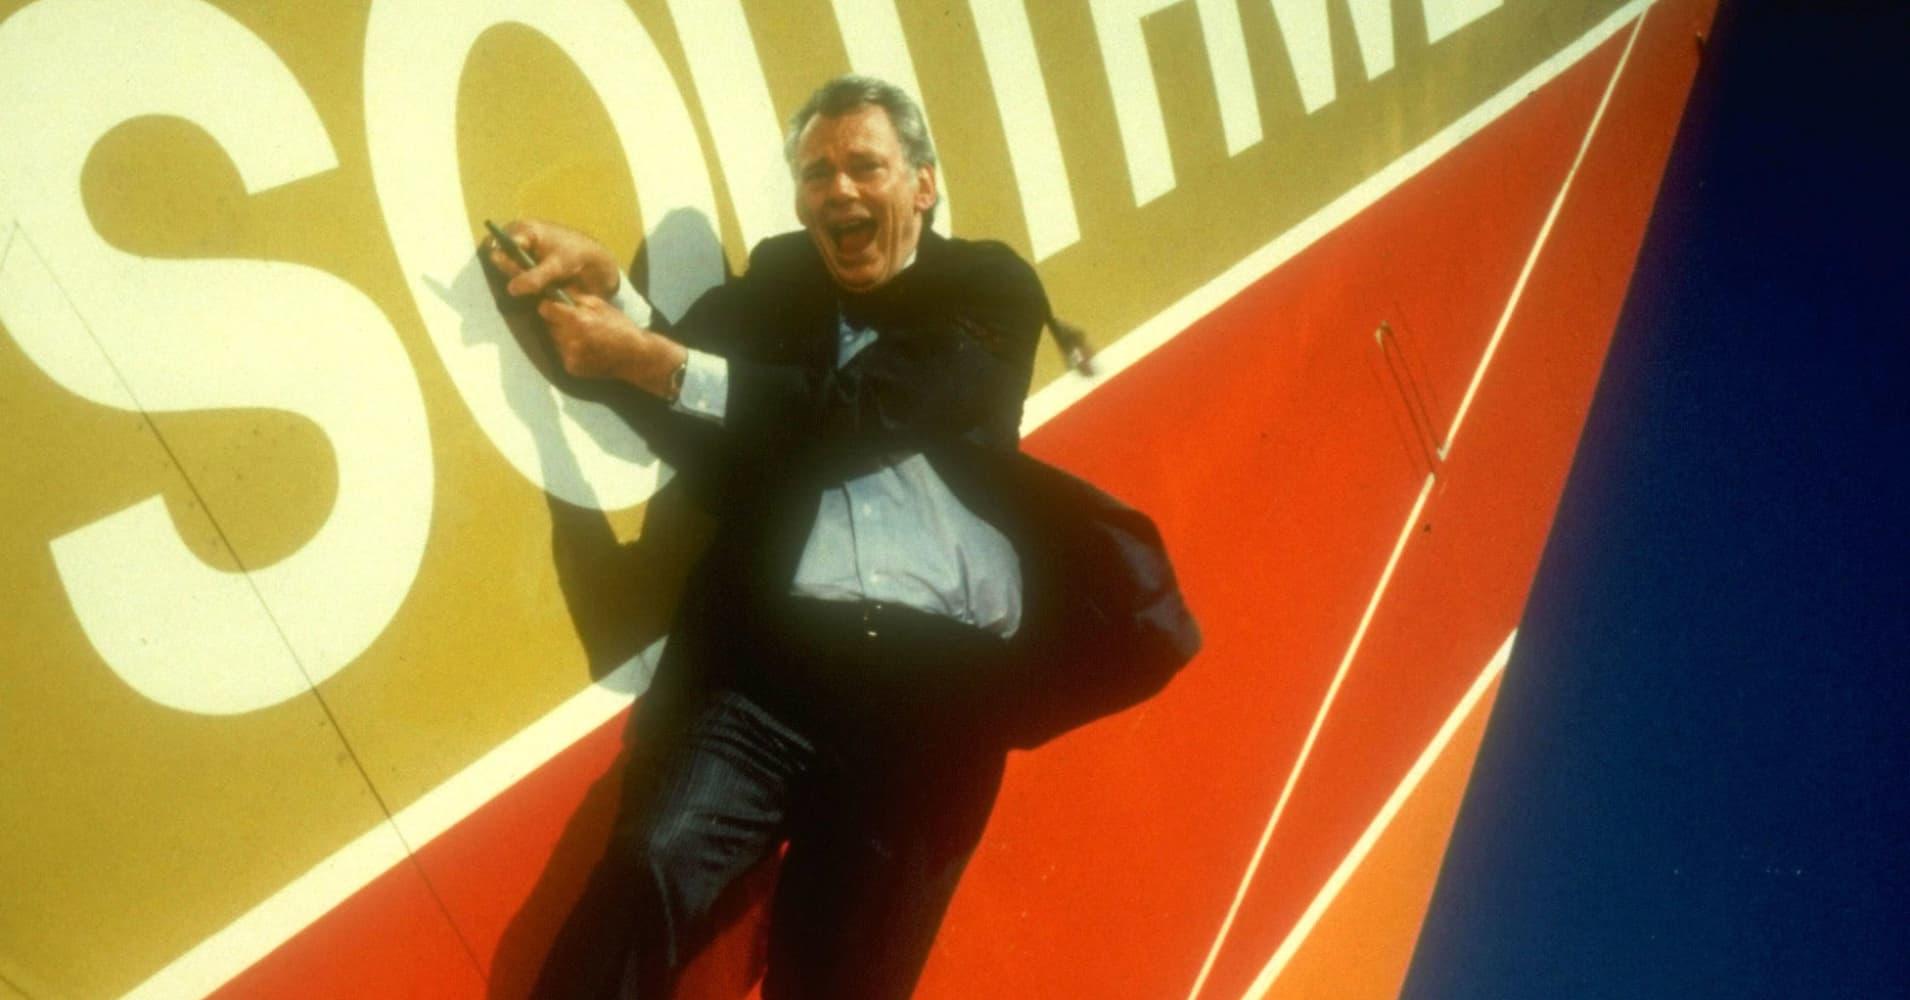 Southwest Airlines founder Herbert Kelleher dies at age 87